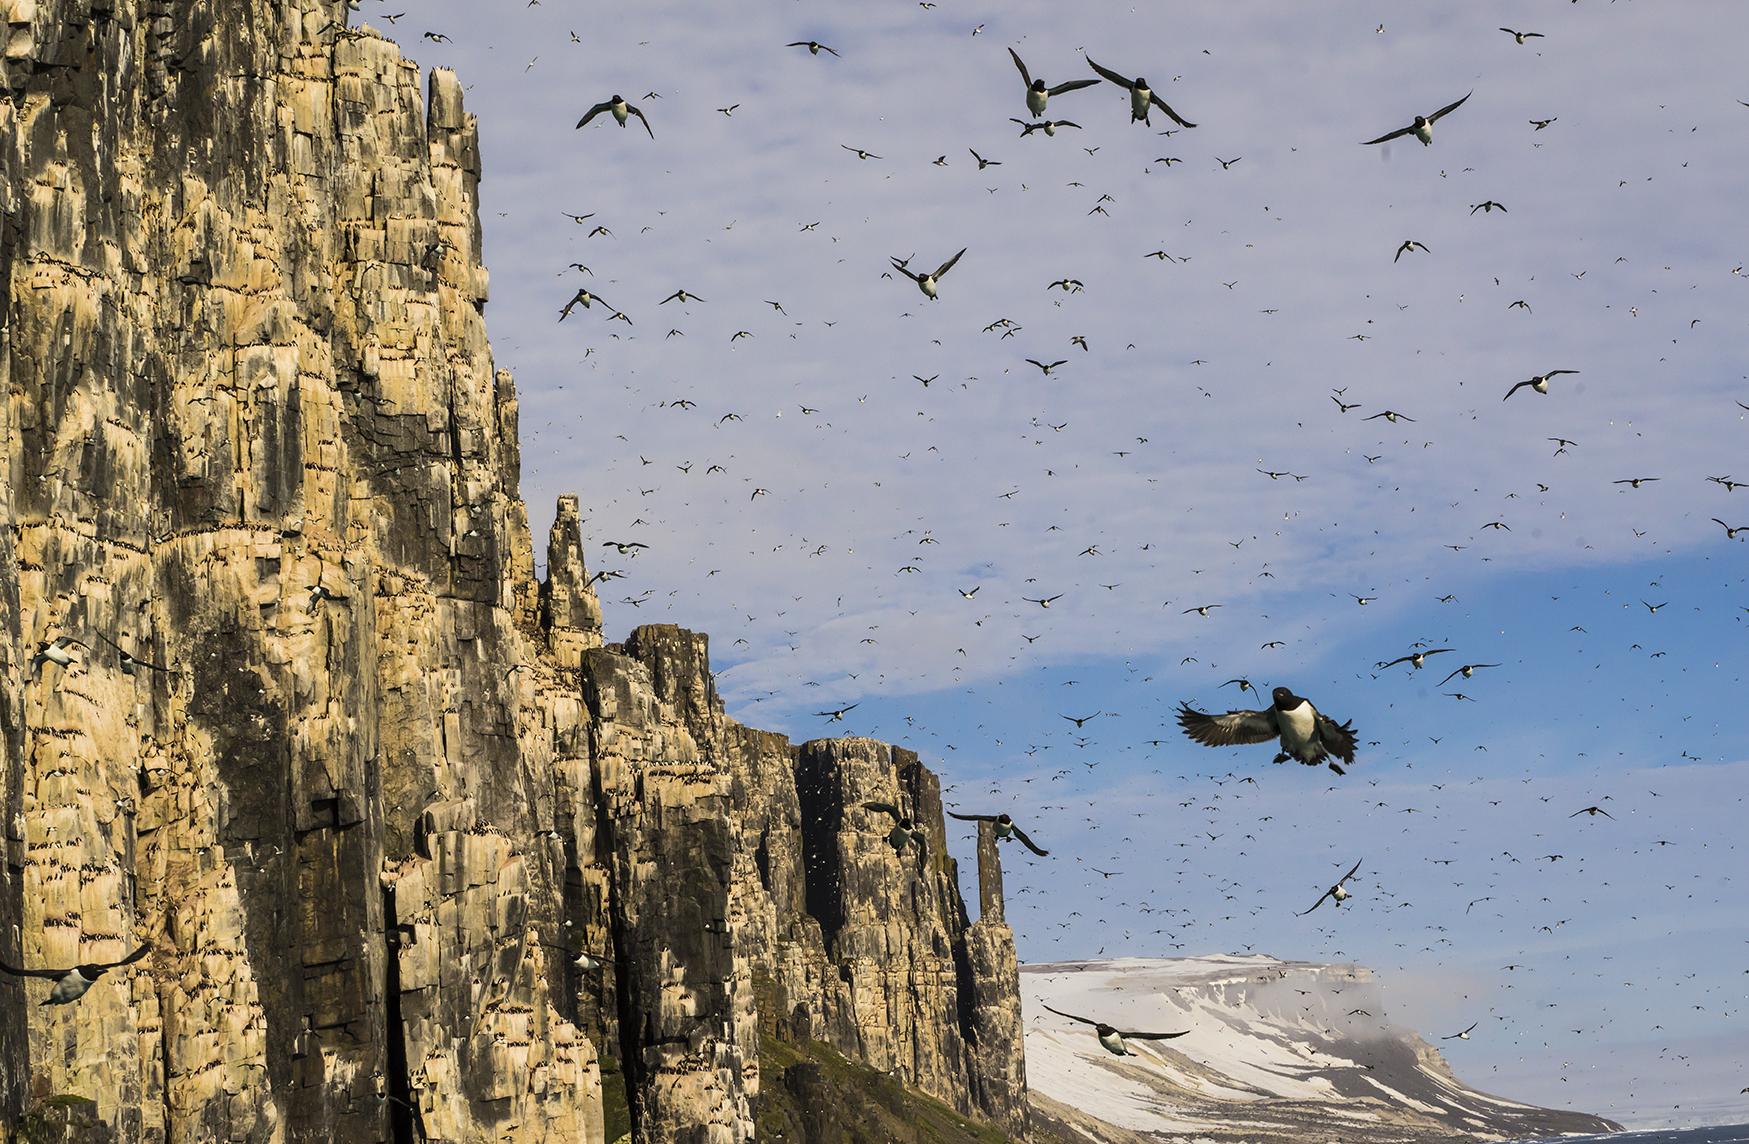 Arctic Birds Svalbard -North Pole